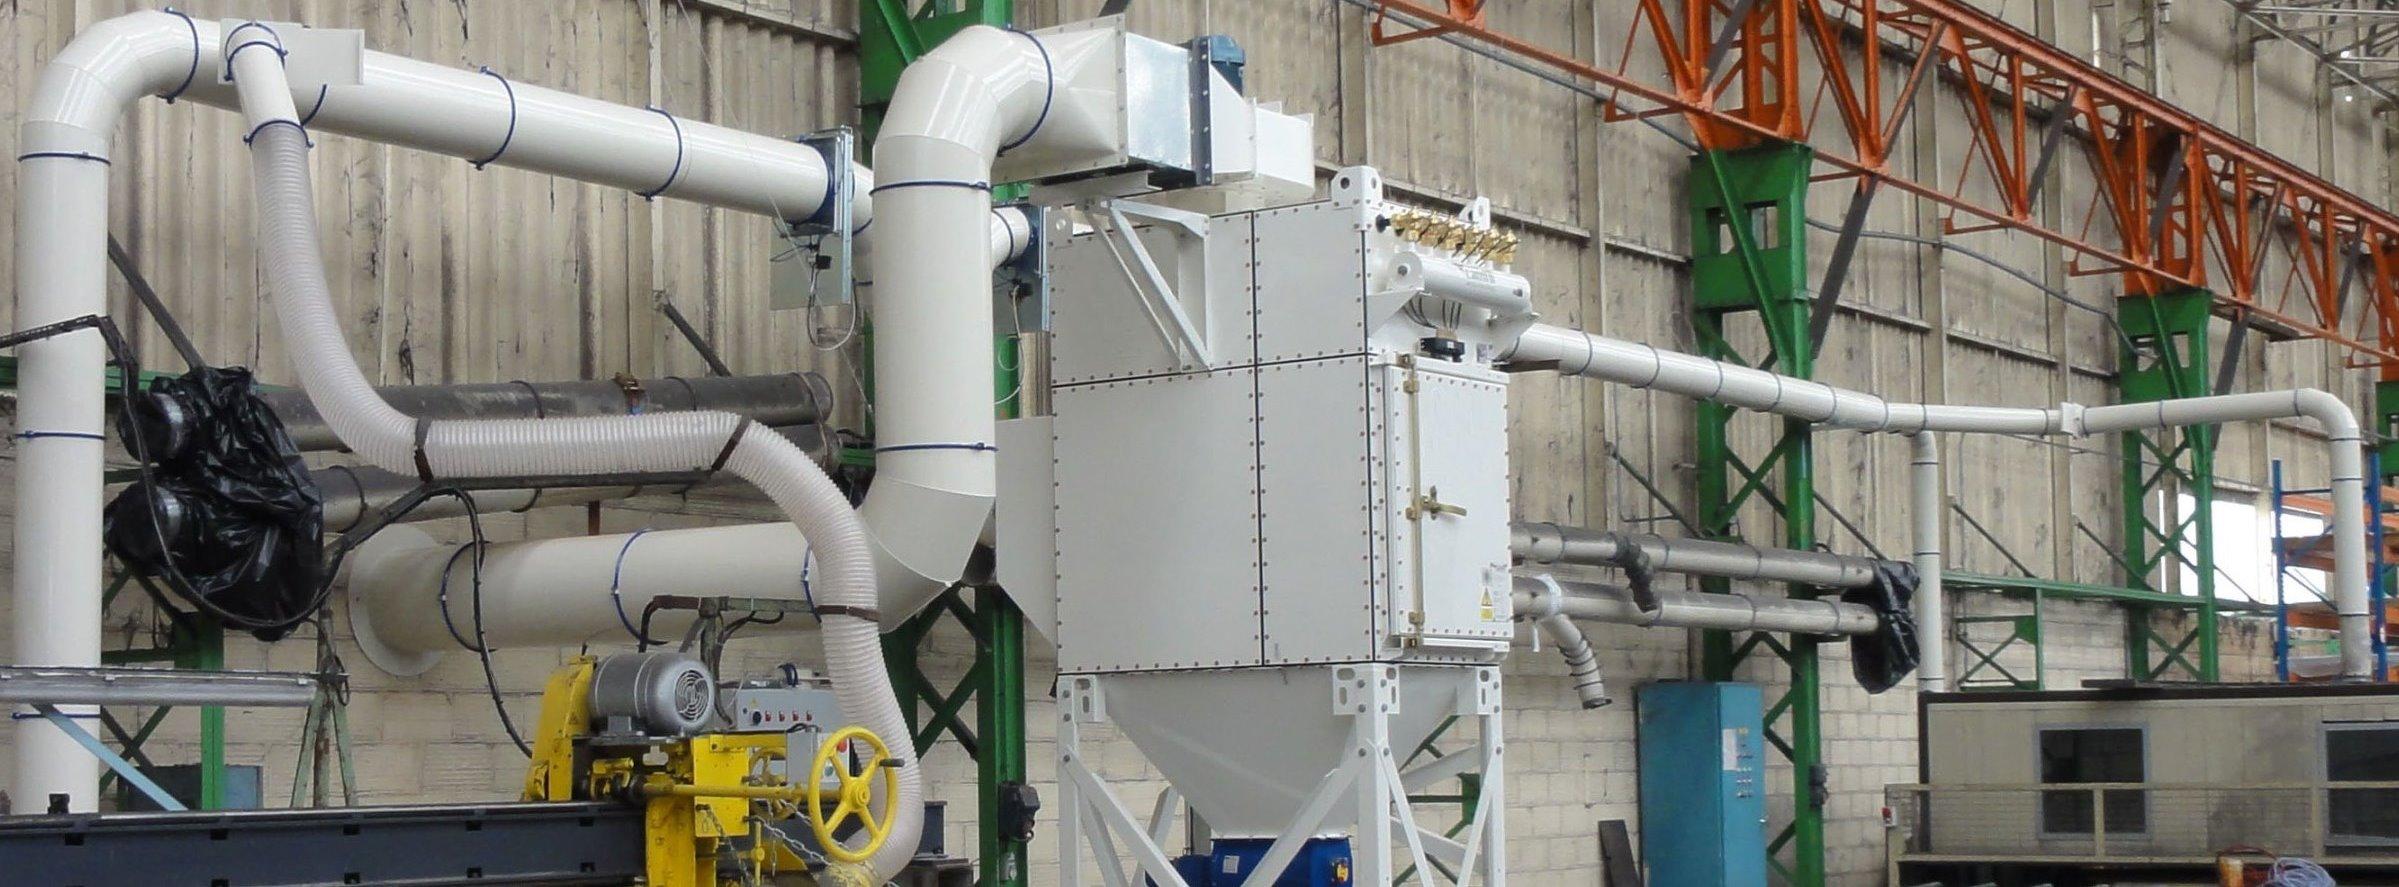 Aspiration filtration depoussierage